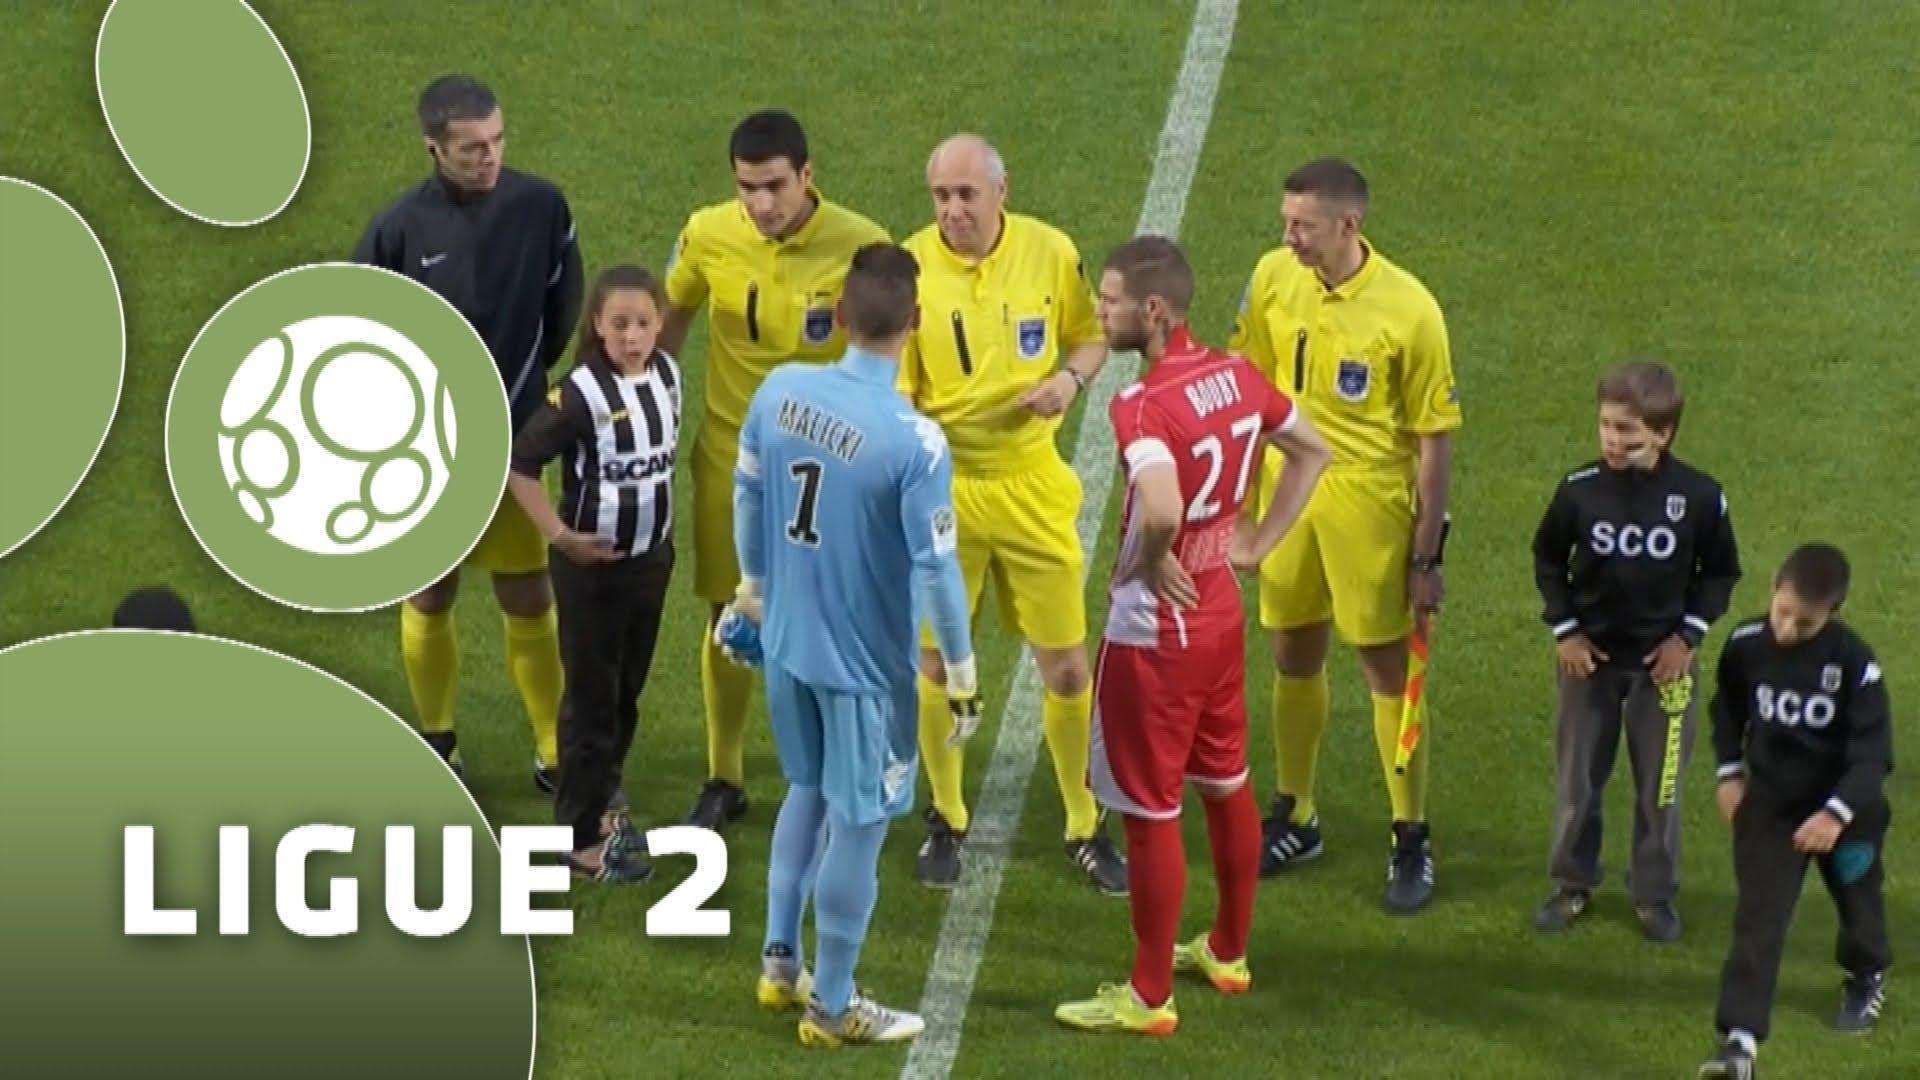 Prediksi Angers SCO vs Nimes Olympique 12 Agustus 2018 SBO303